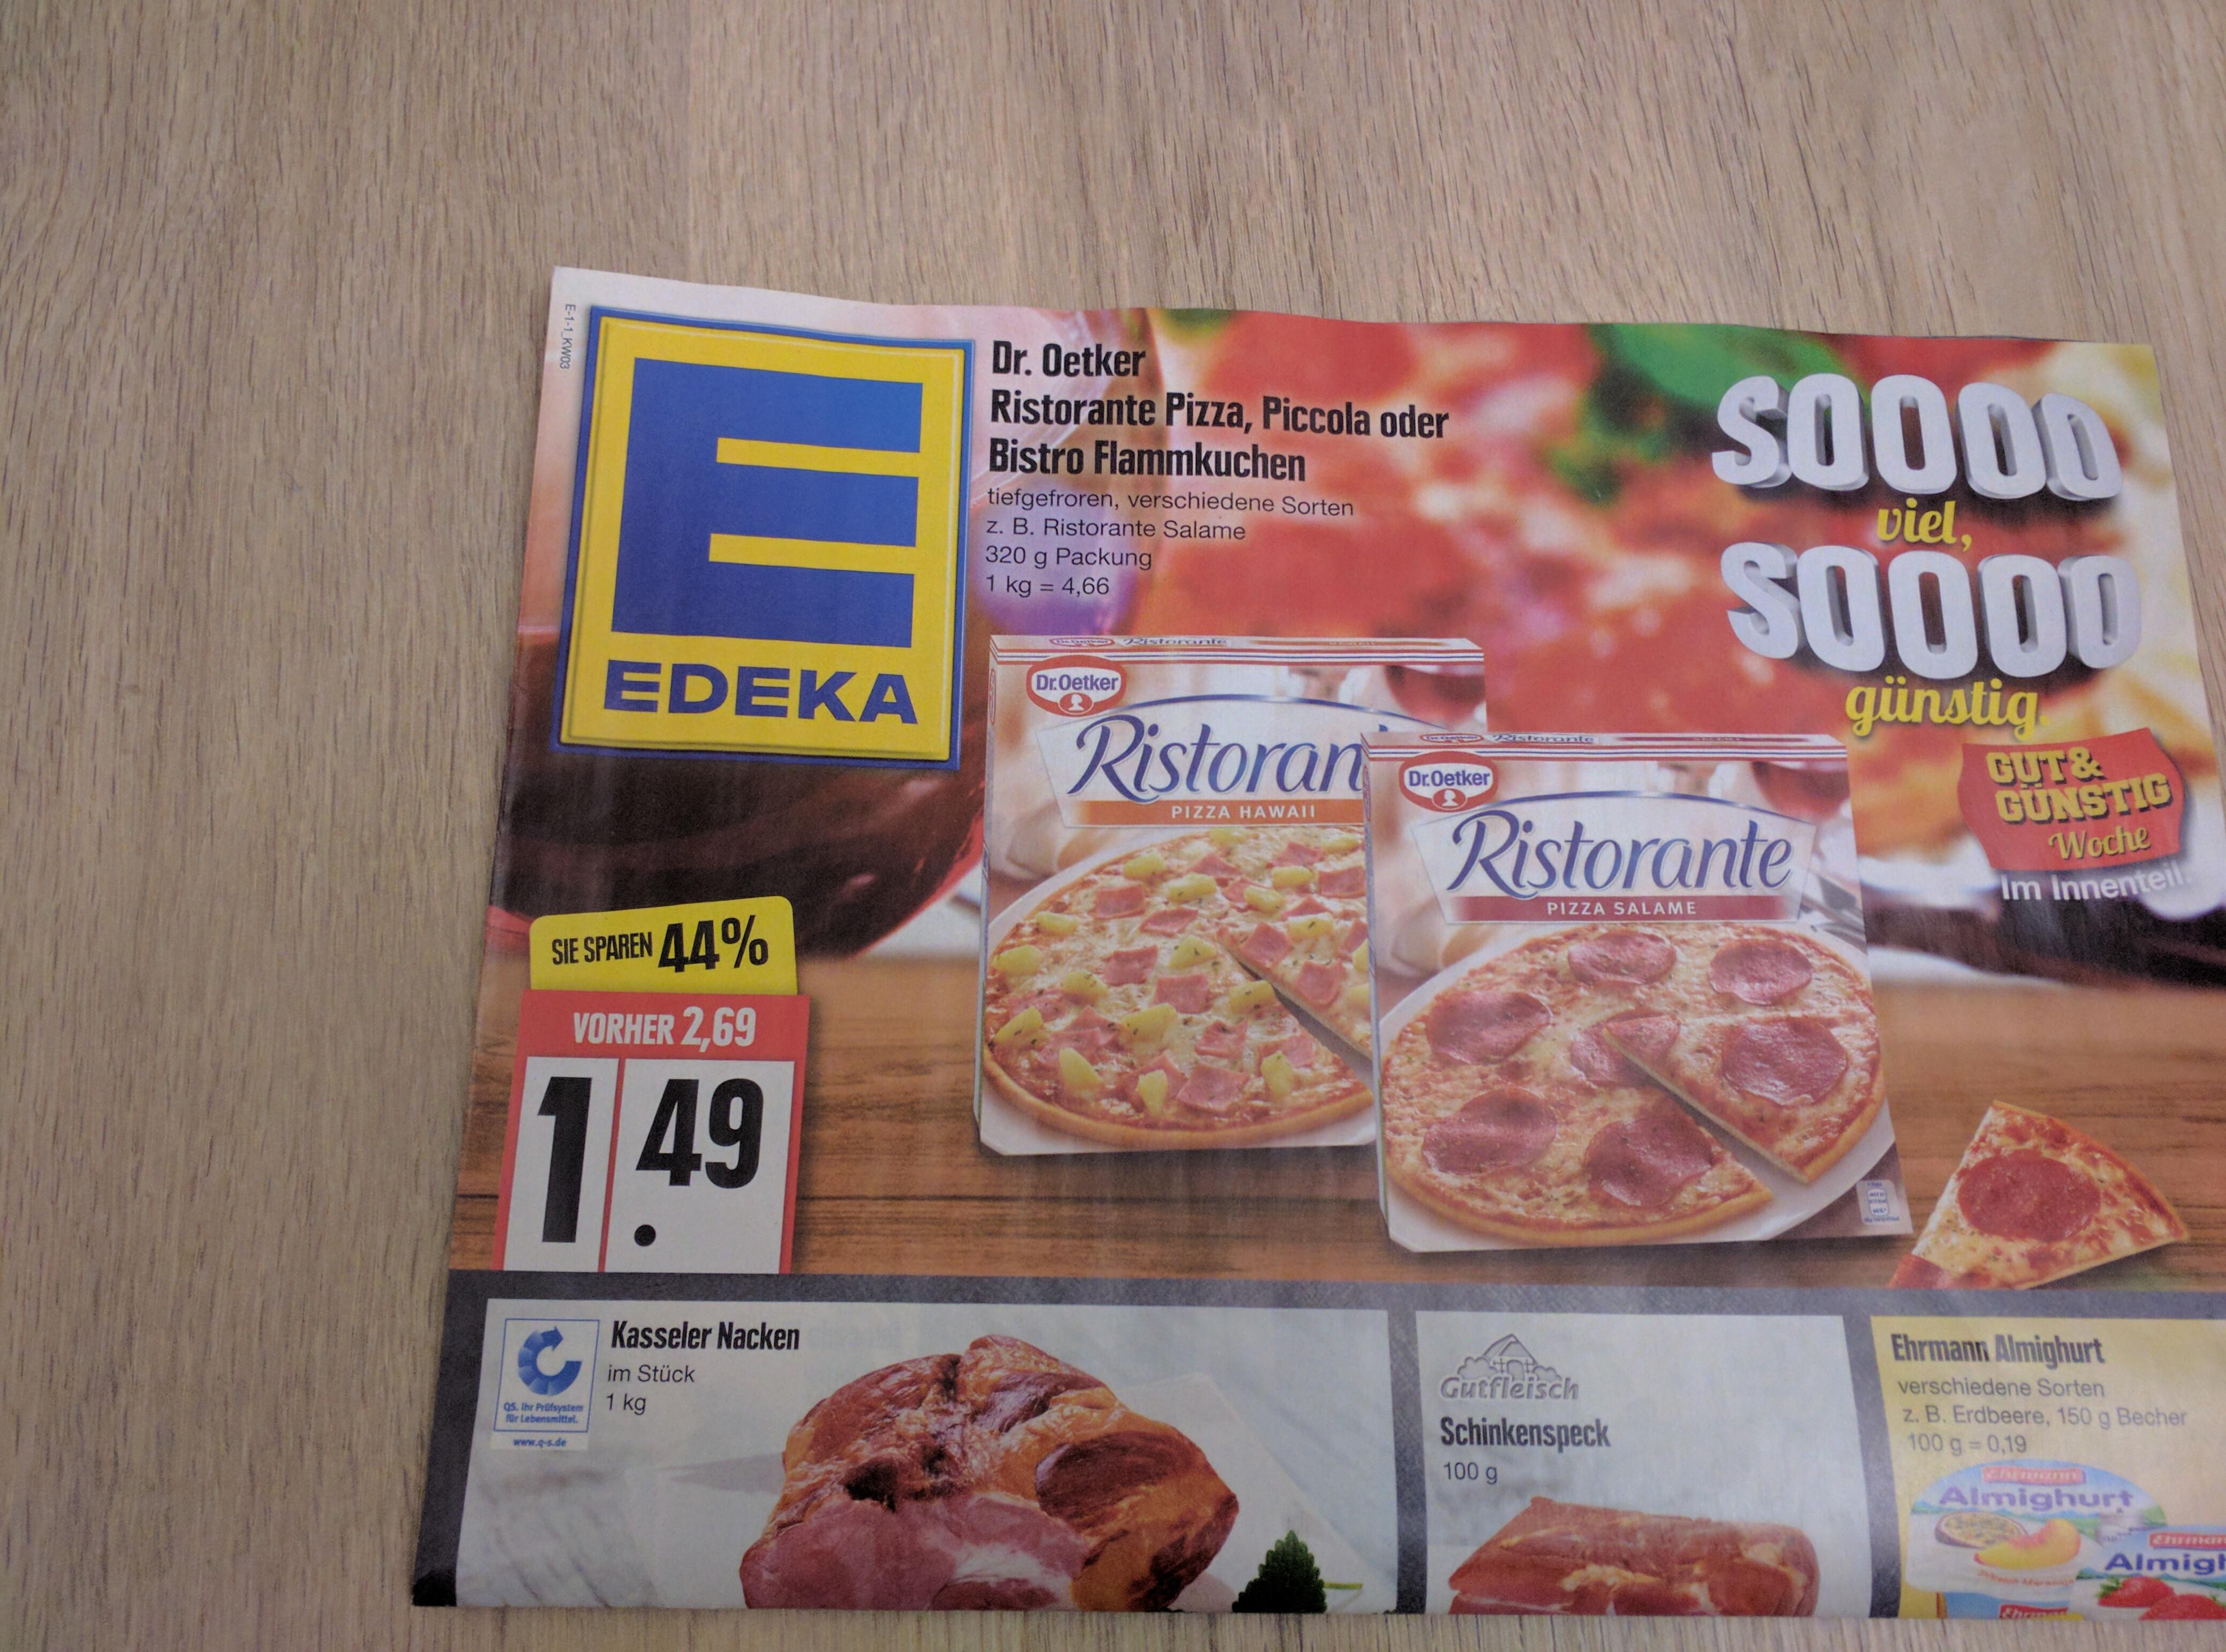 [lokal HH] Dr. Oetker Ristorante Pizza, Piccola oder Flammkuchen